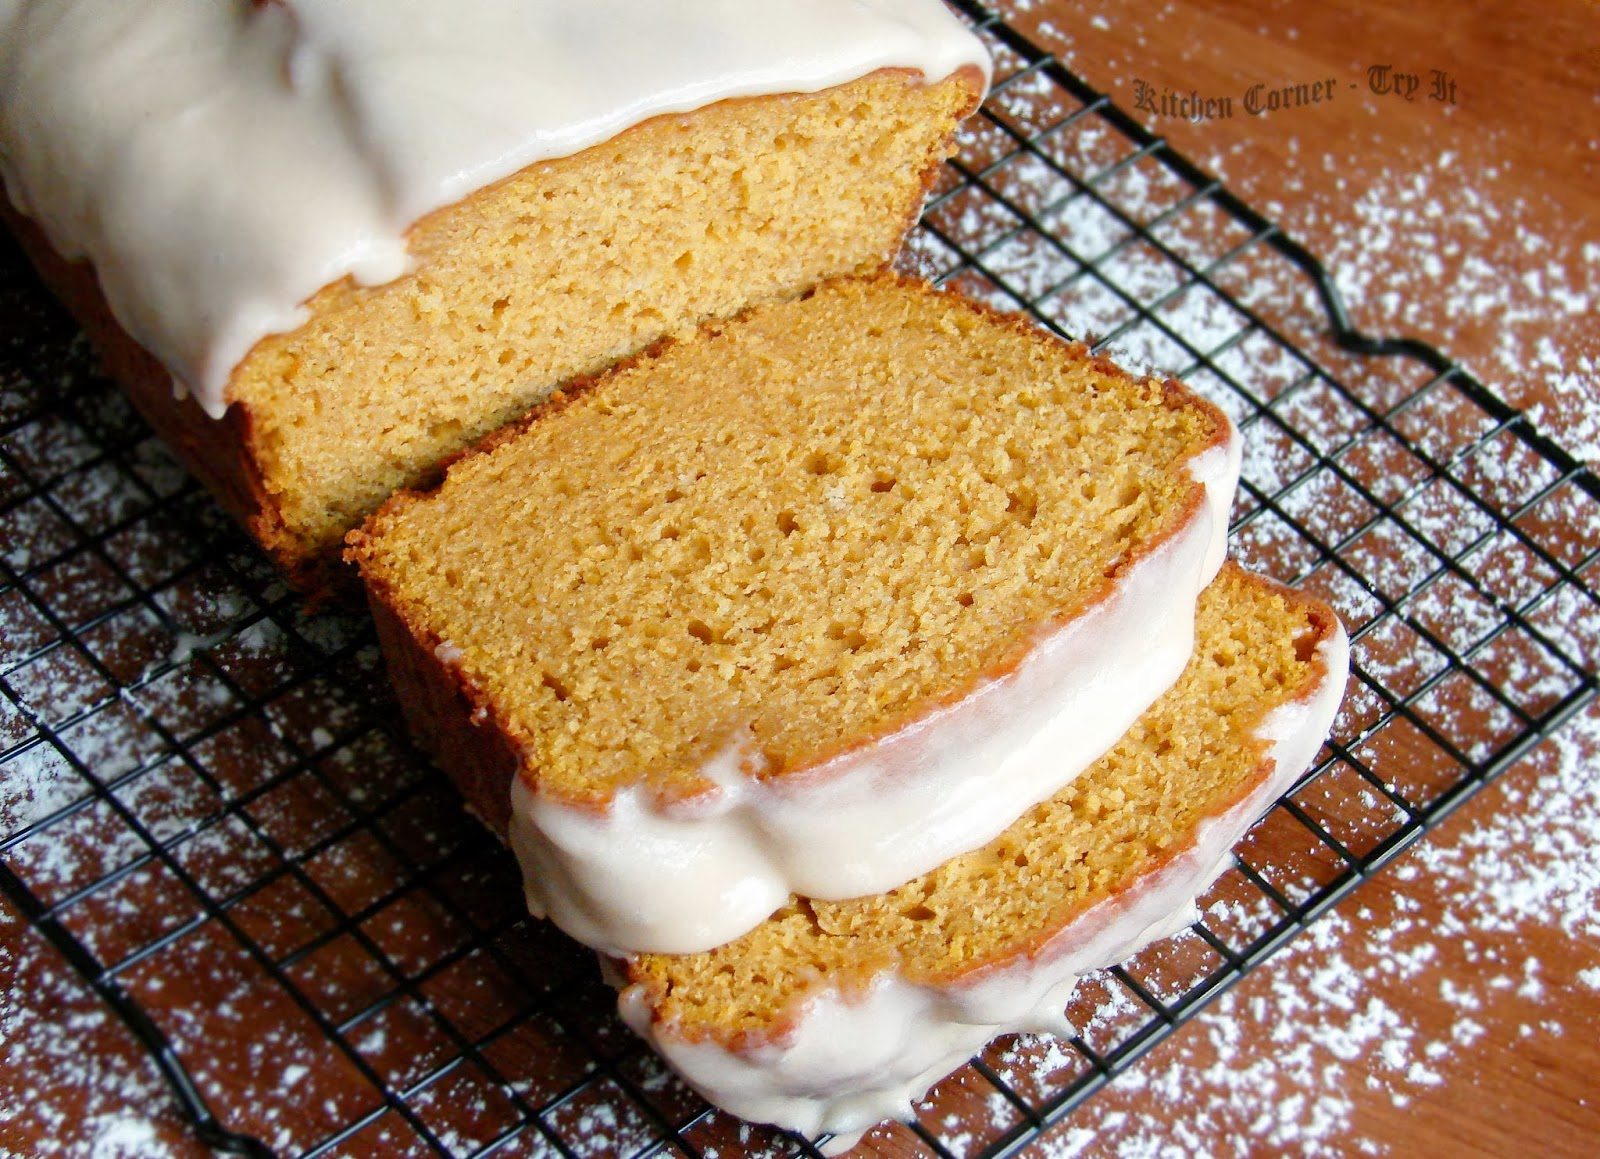 Corner Bakery Cinnamon Creme Cake Ingredients